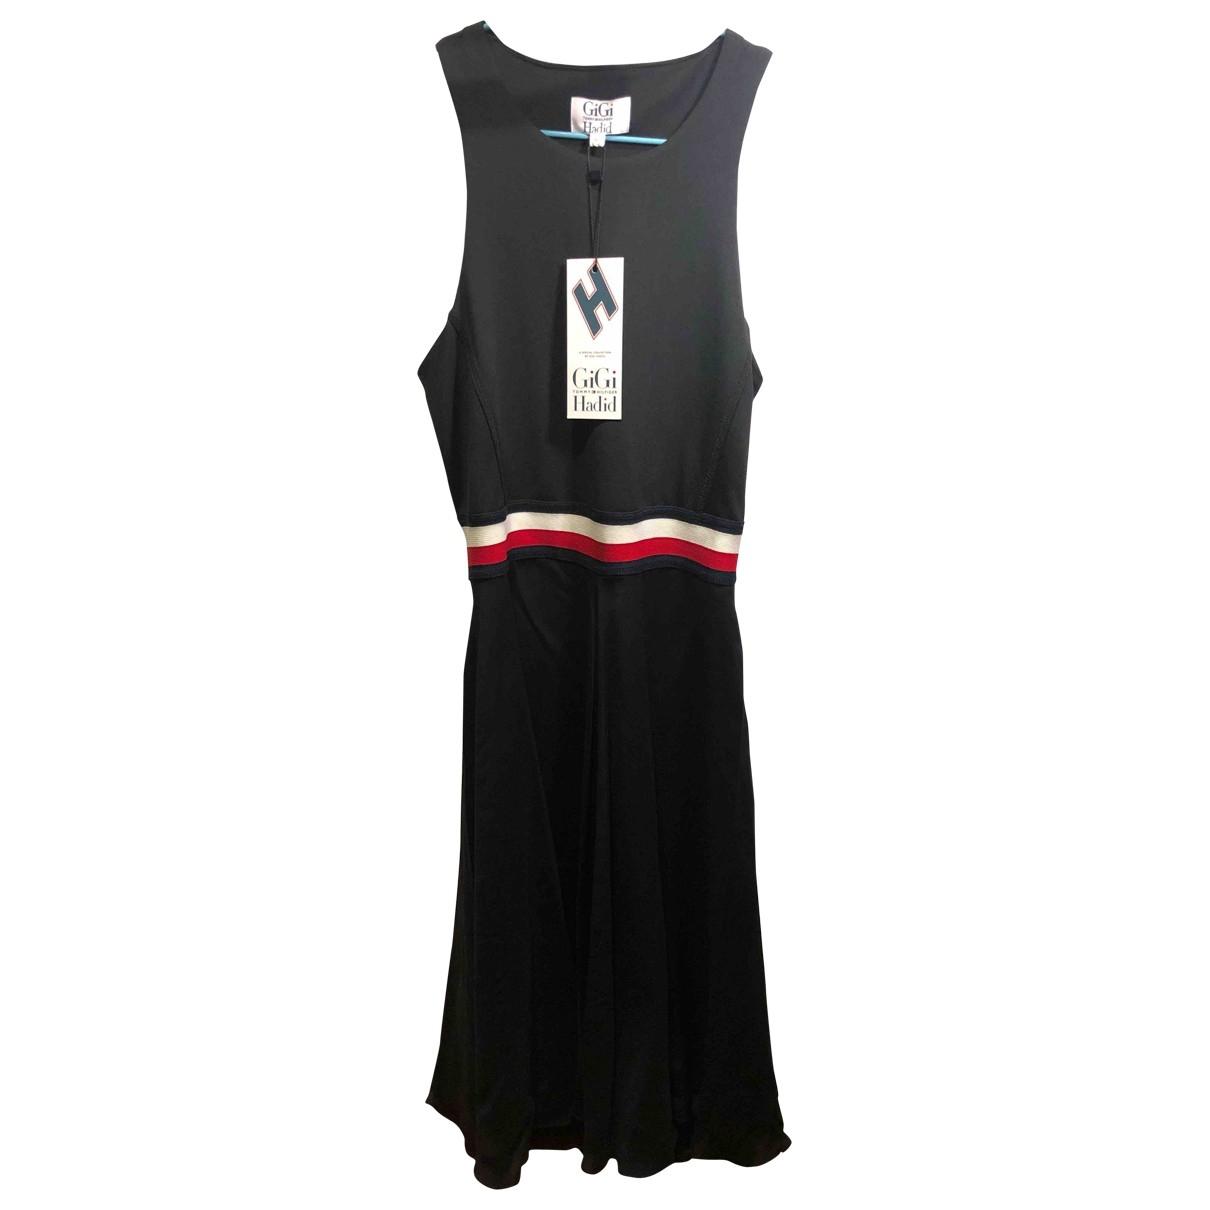 Tommy Hilfiger \N Kleid in  Schwarz Baumwolle - Elasthan